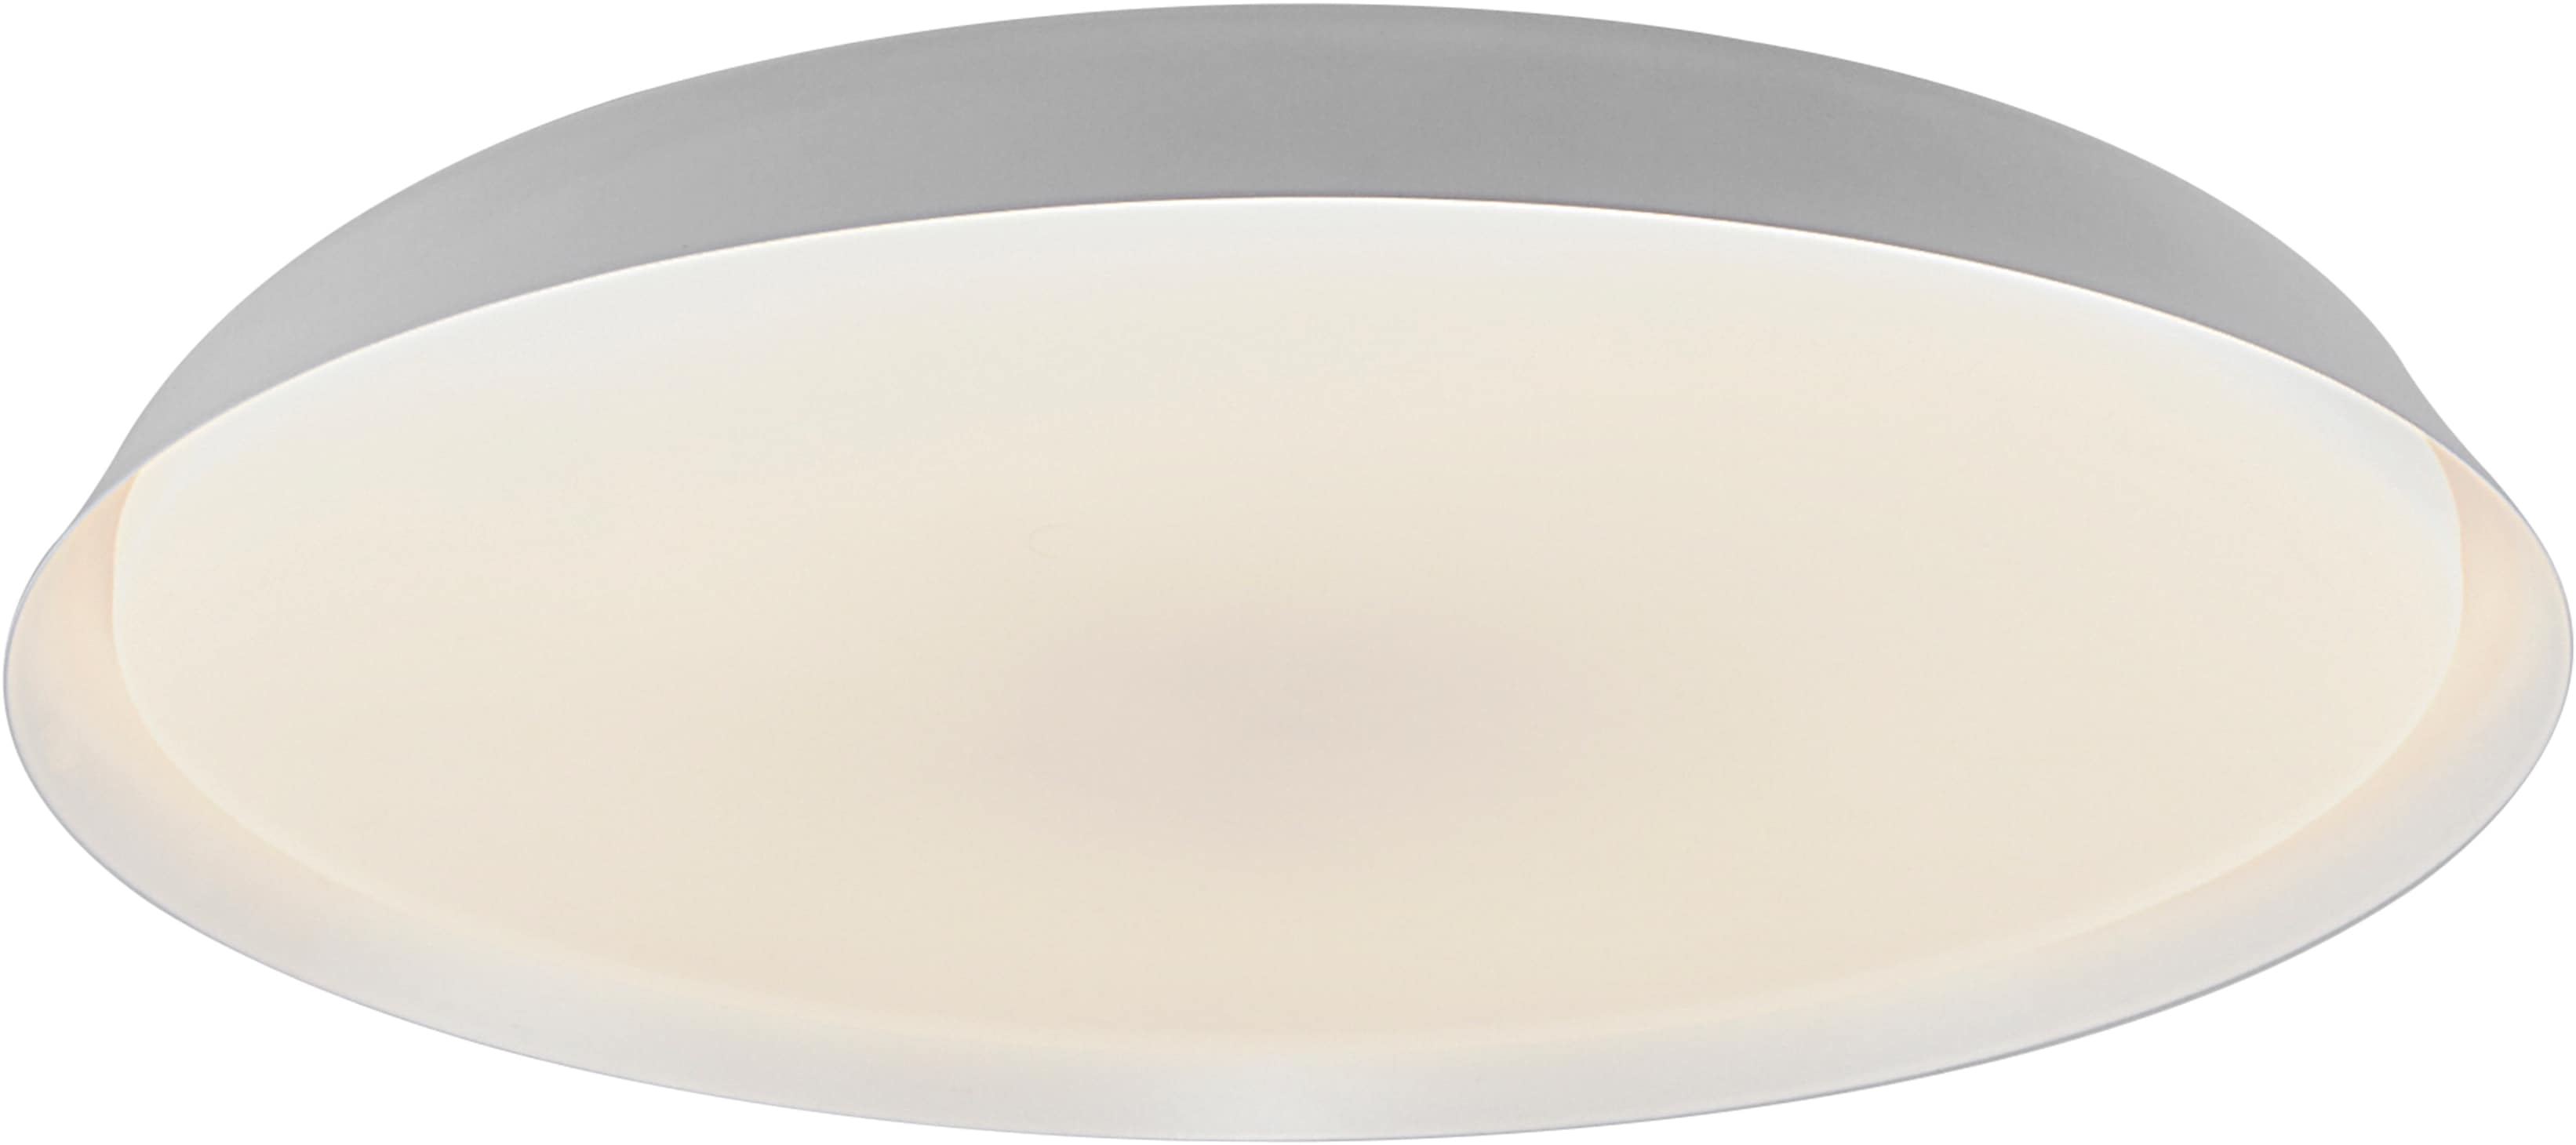 Nordlux LED Deckenleuchte PISO, LED-Modul, inkl. LED Modul, inkl. Farbwechsel, 5 Jahre LED Garantie